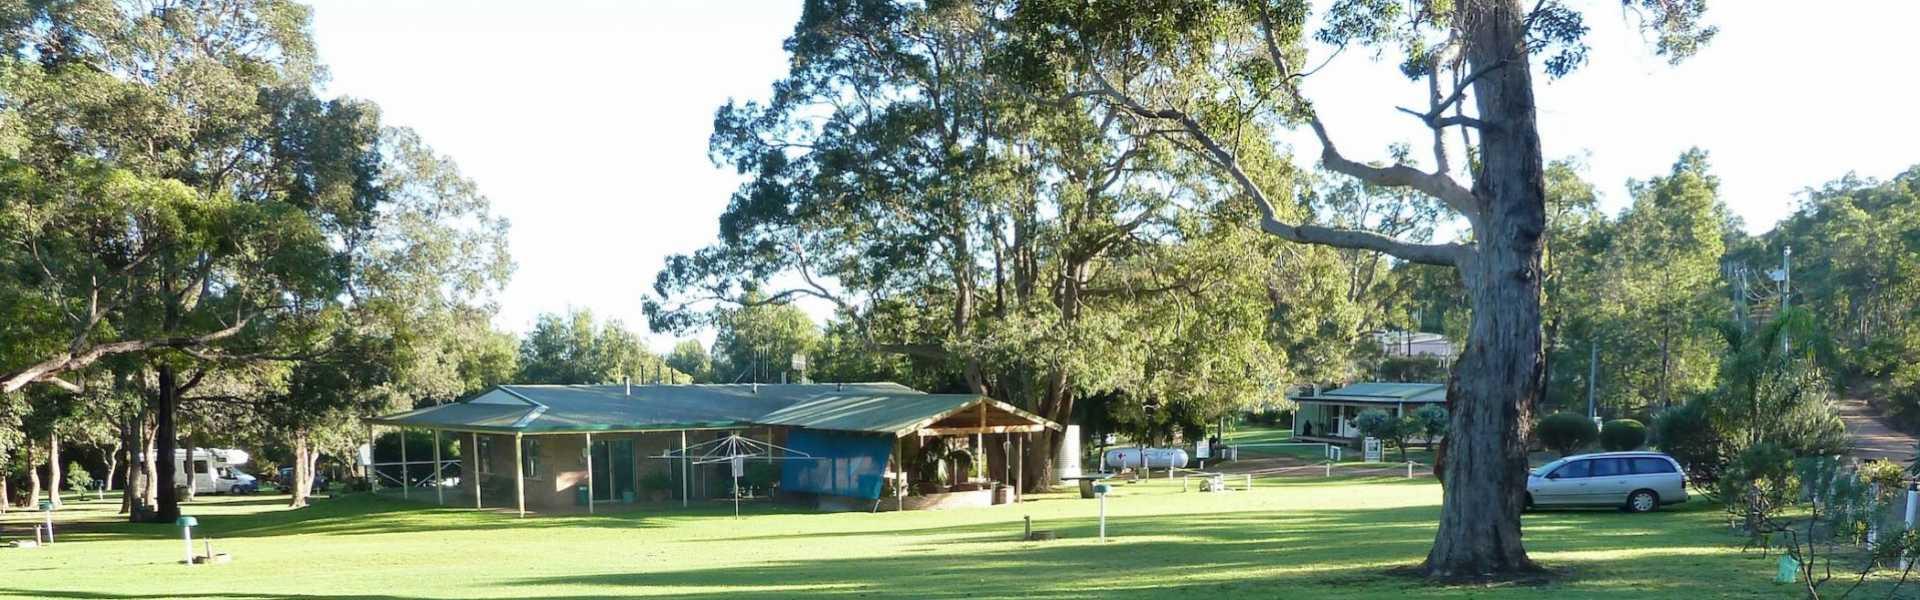 Kui Parks, Porongurup Range Tourist Park, Sites